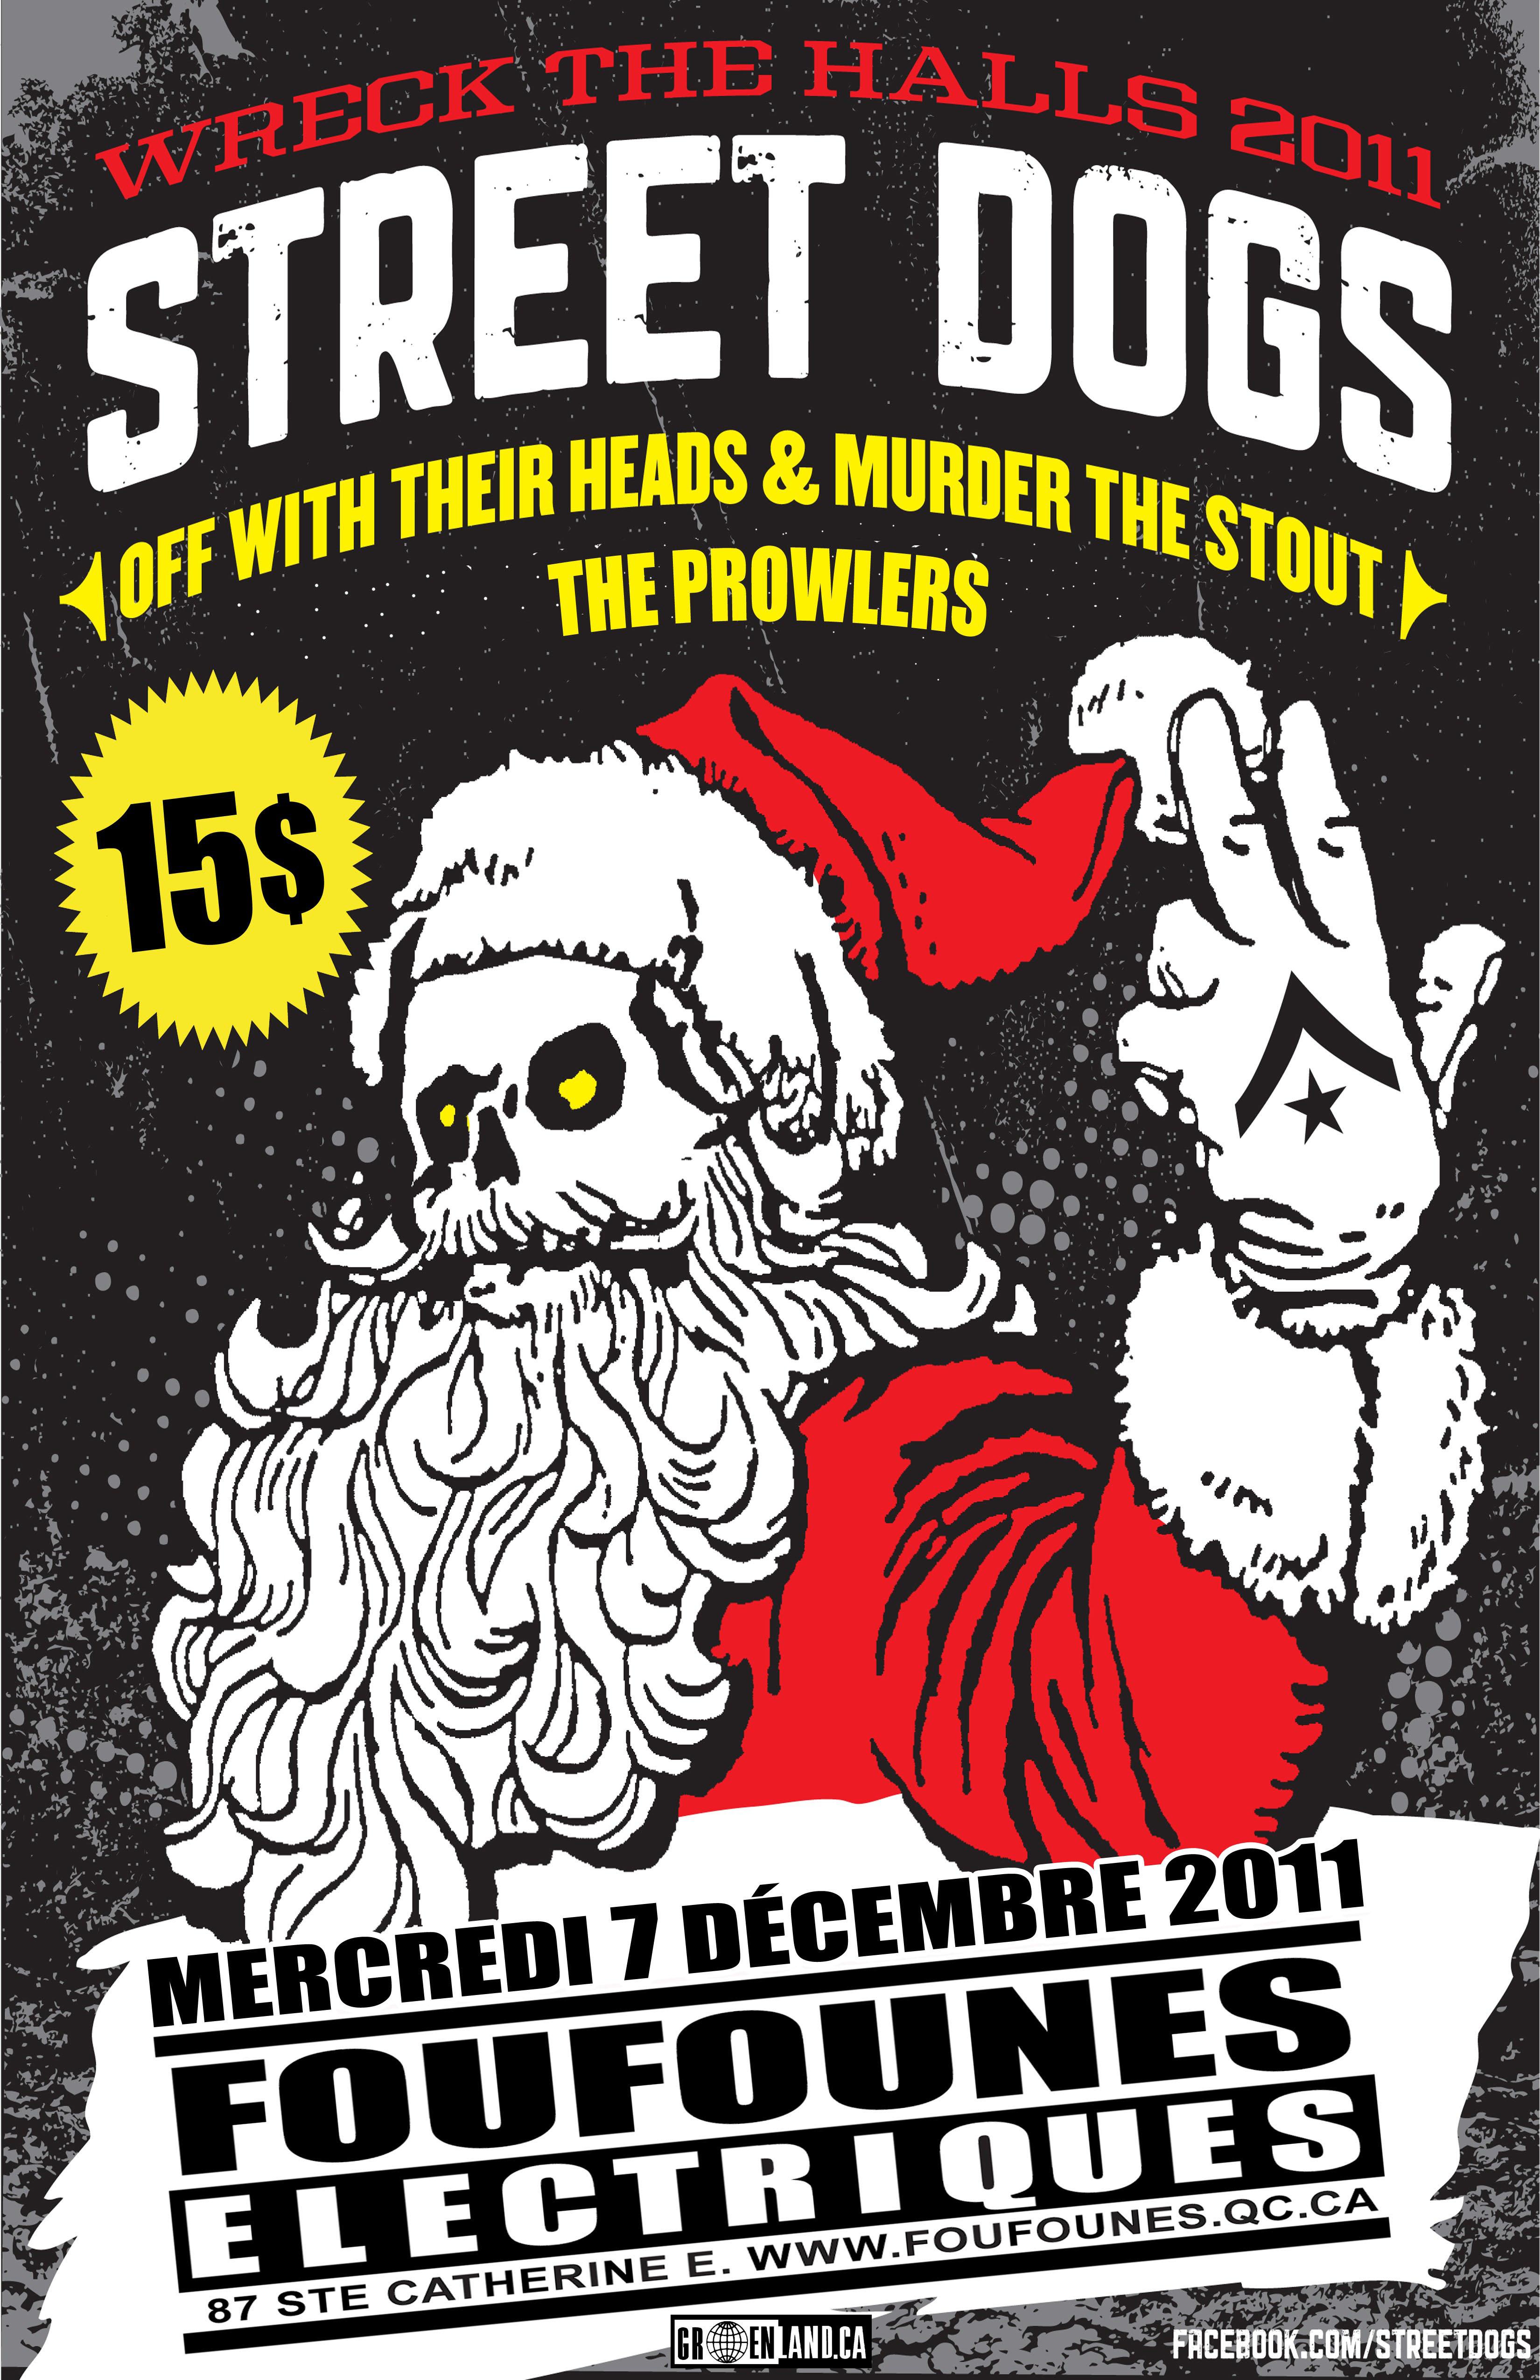 StreetDogs(Dec11)_poster